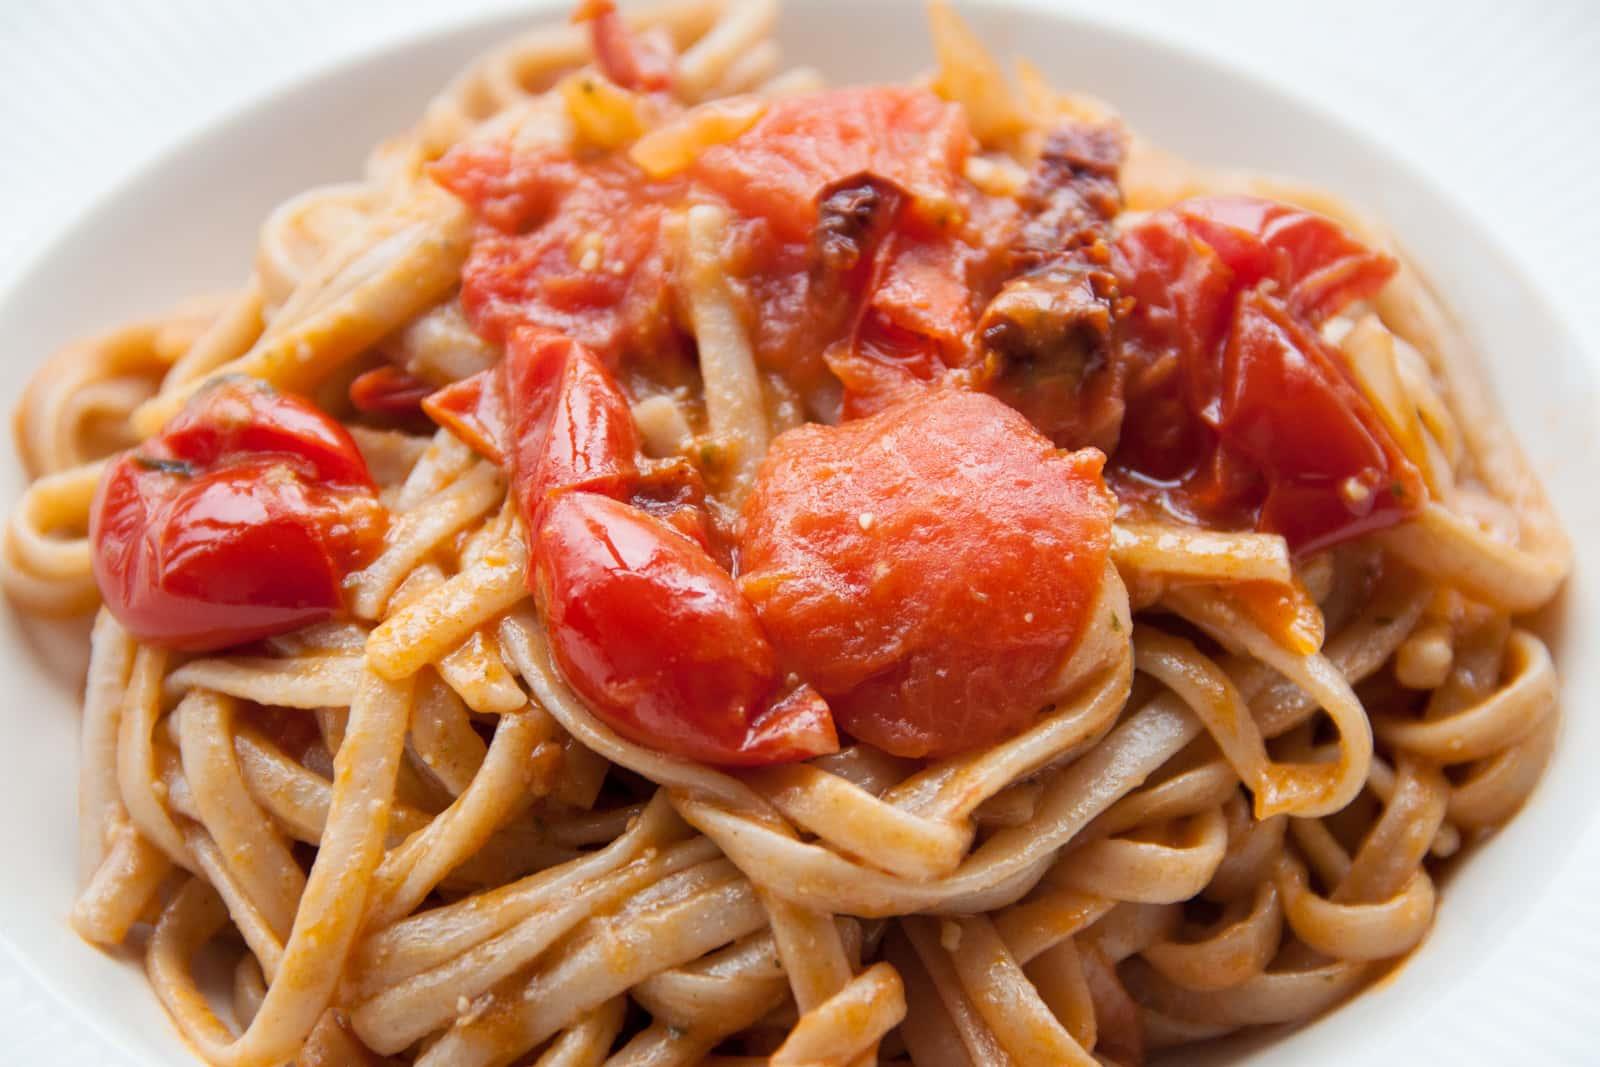 Gluten free pasta al pomodoro